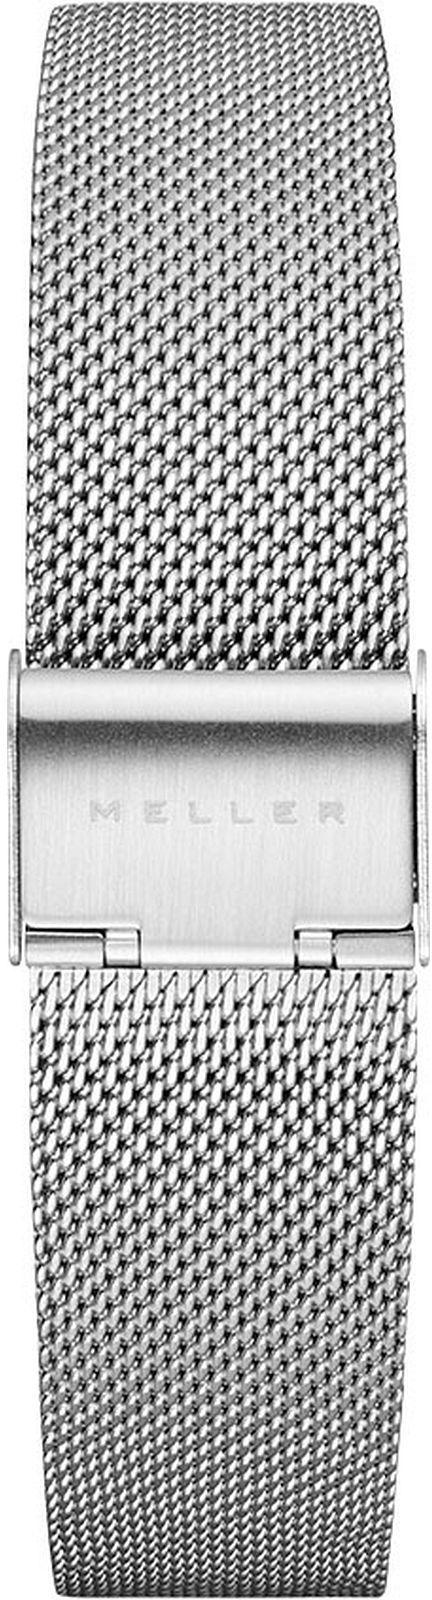 Bransoleta Meller Silver Metal 20 mm